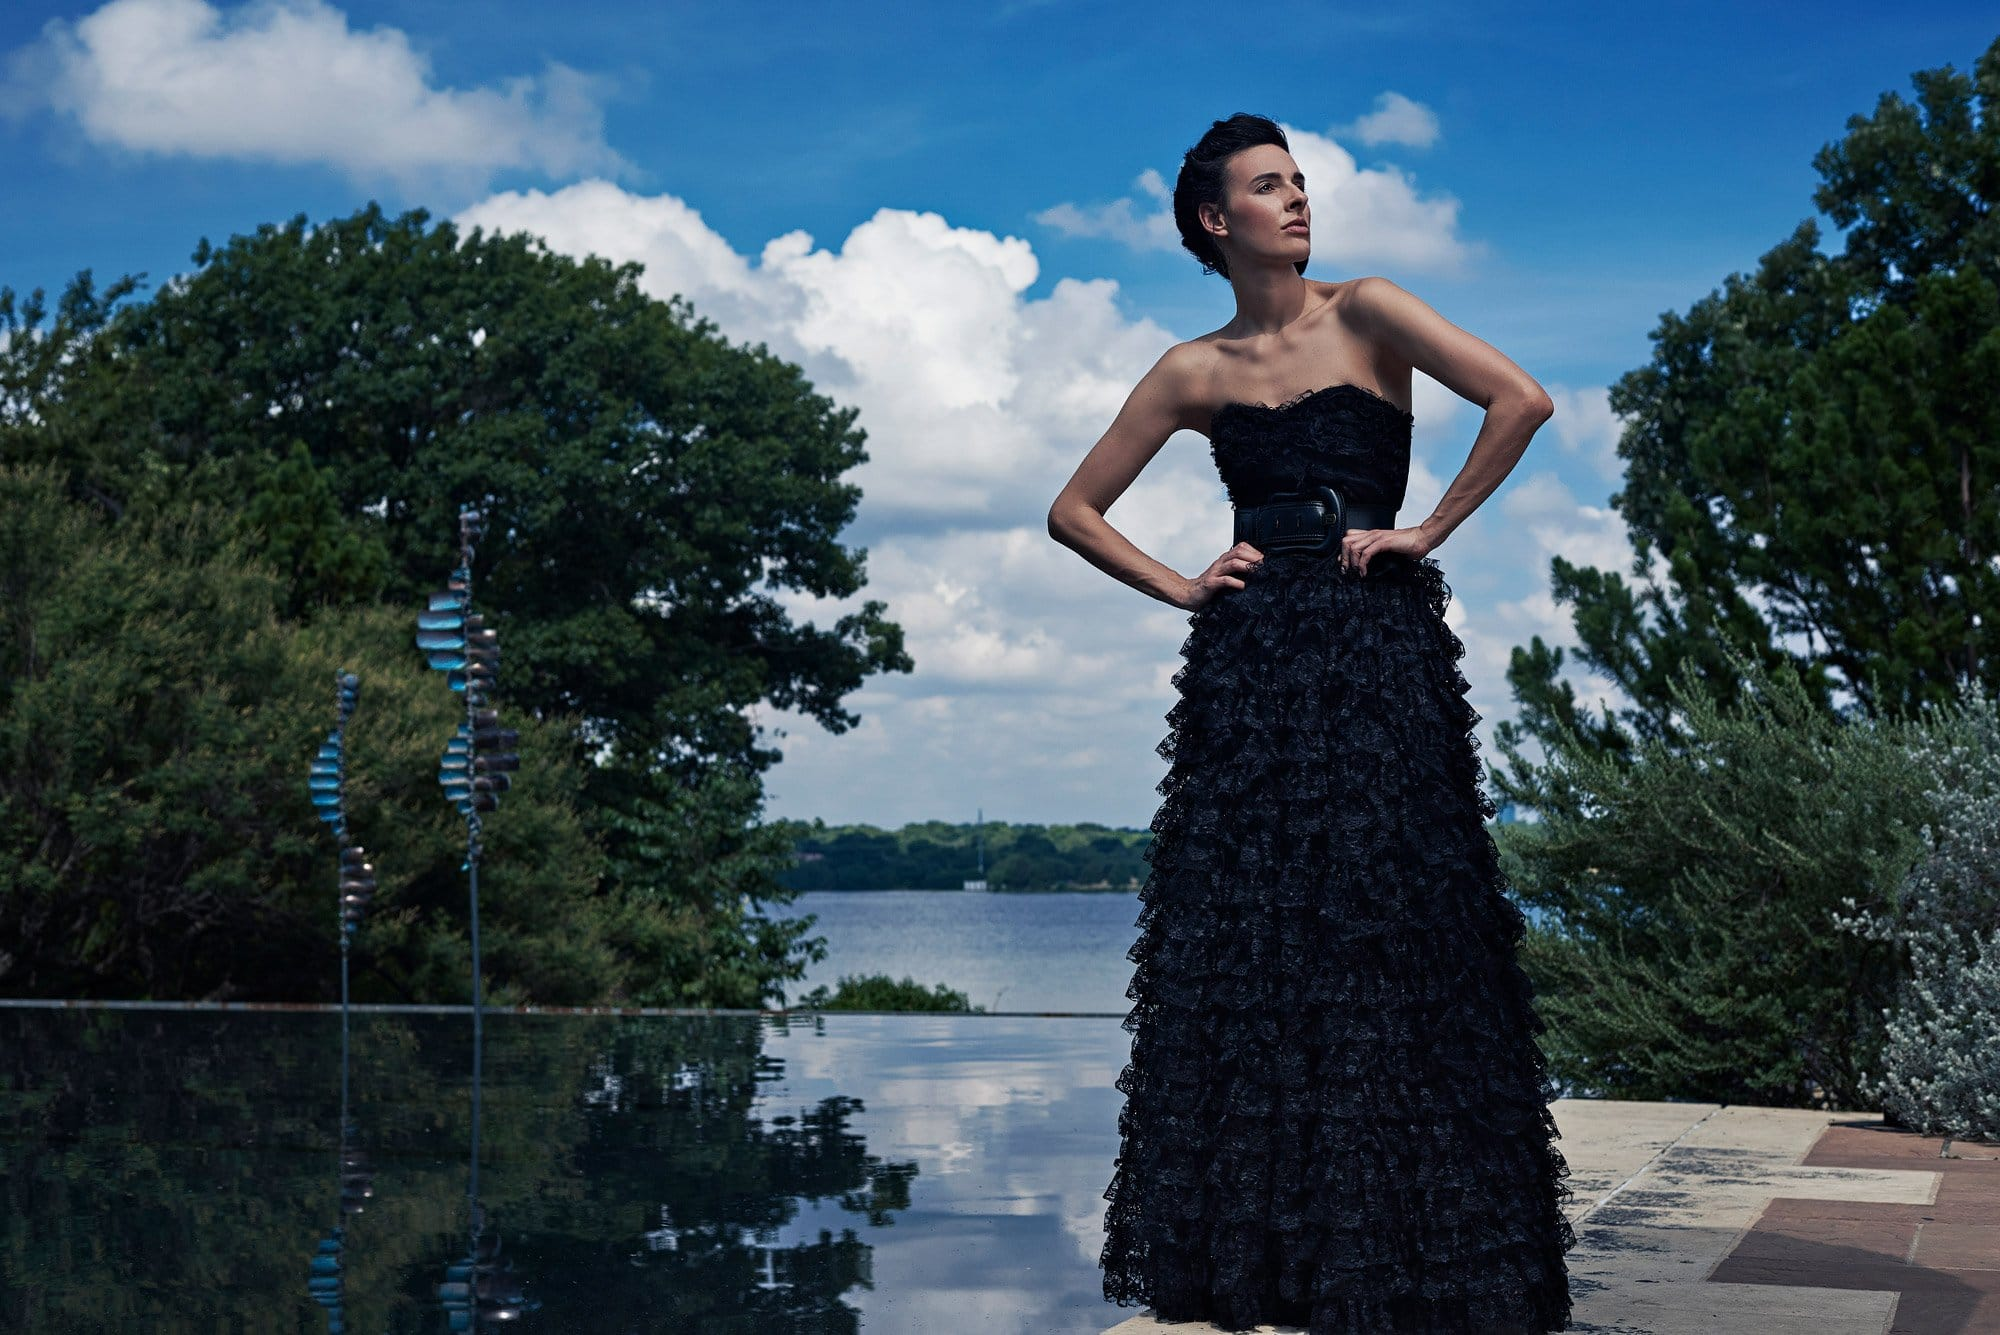 Fashion portrait at Dallas Arboretum woman's garden